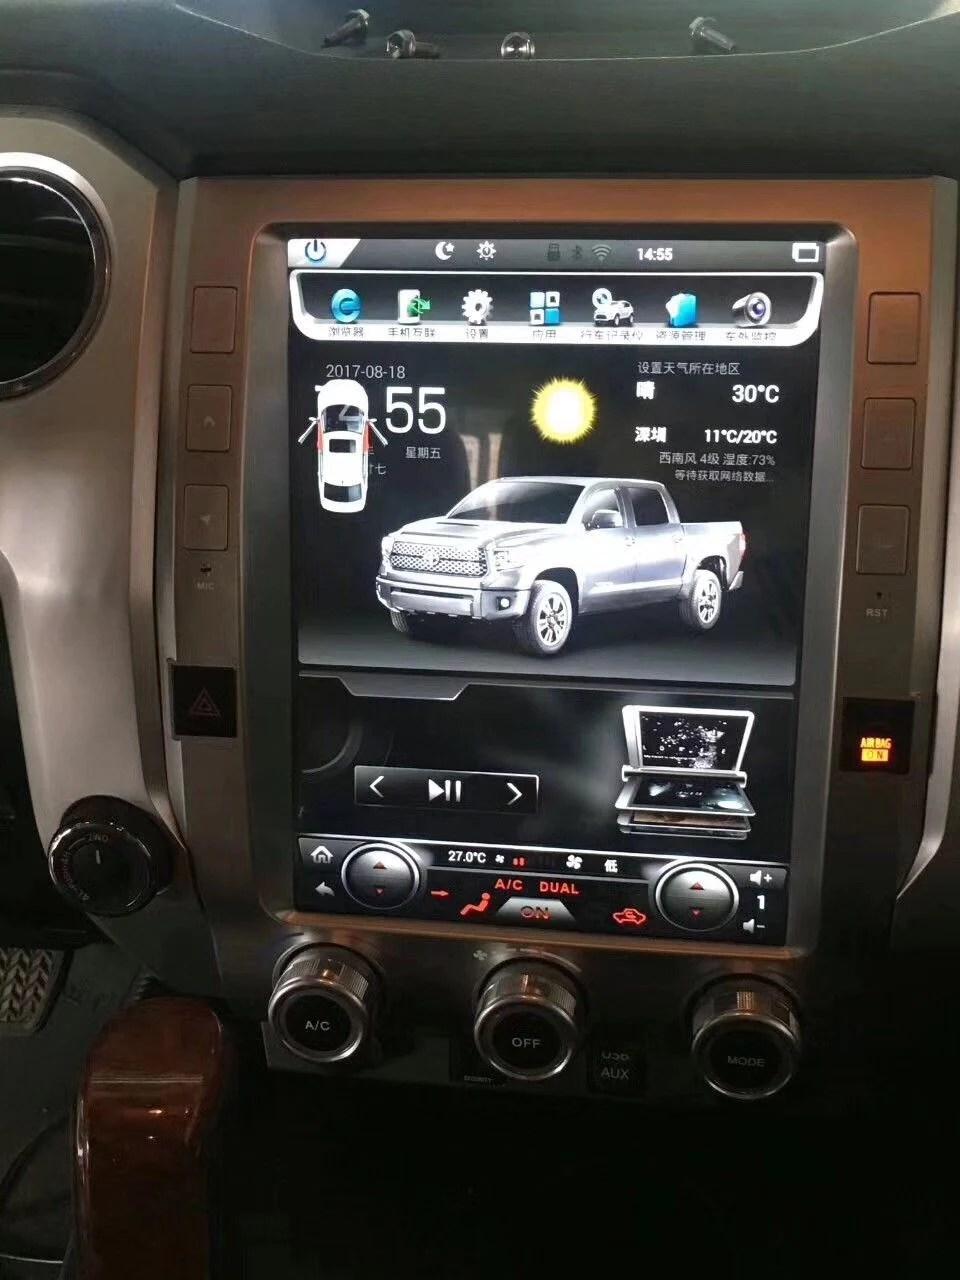 rhino radios toyota tundra 2014 2017 12 1 vertical screen android radio [ 960 x 1280 Pixel ]